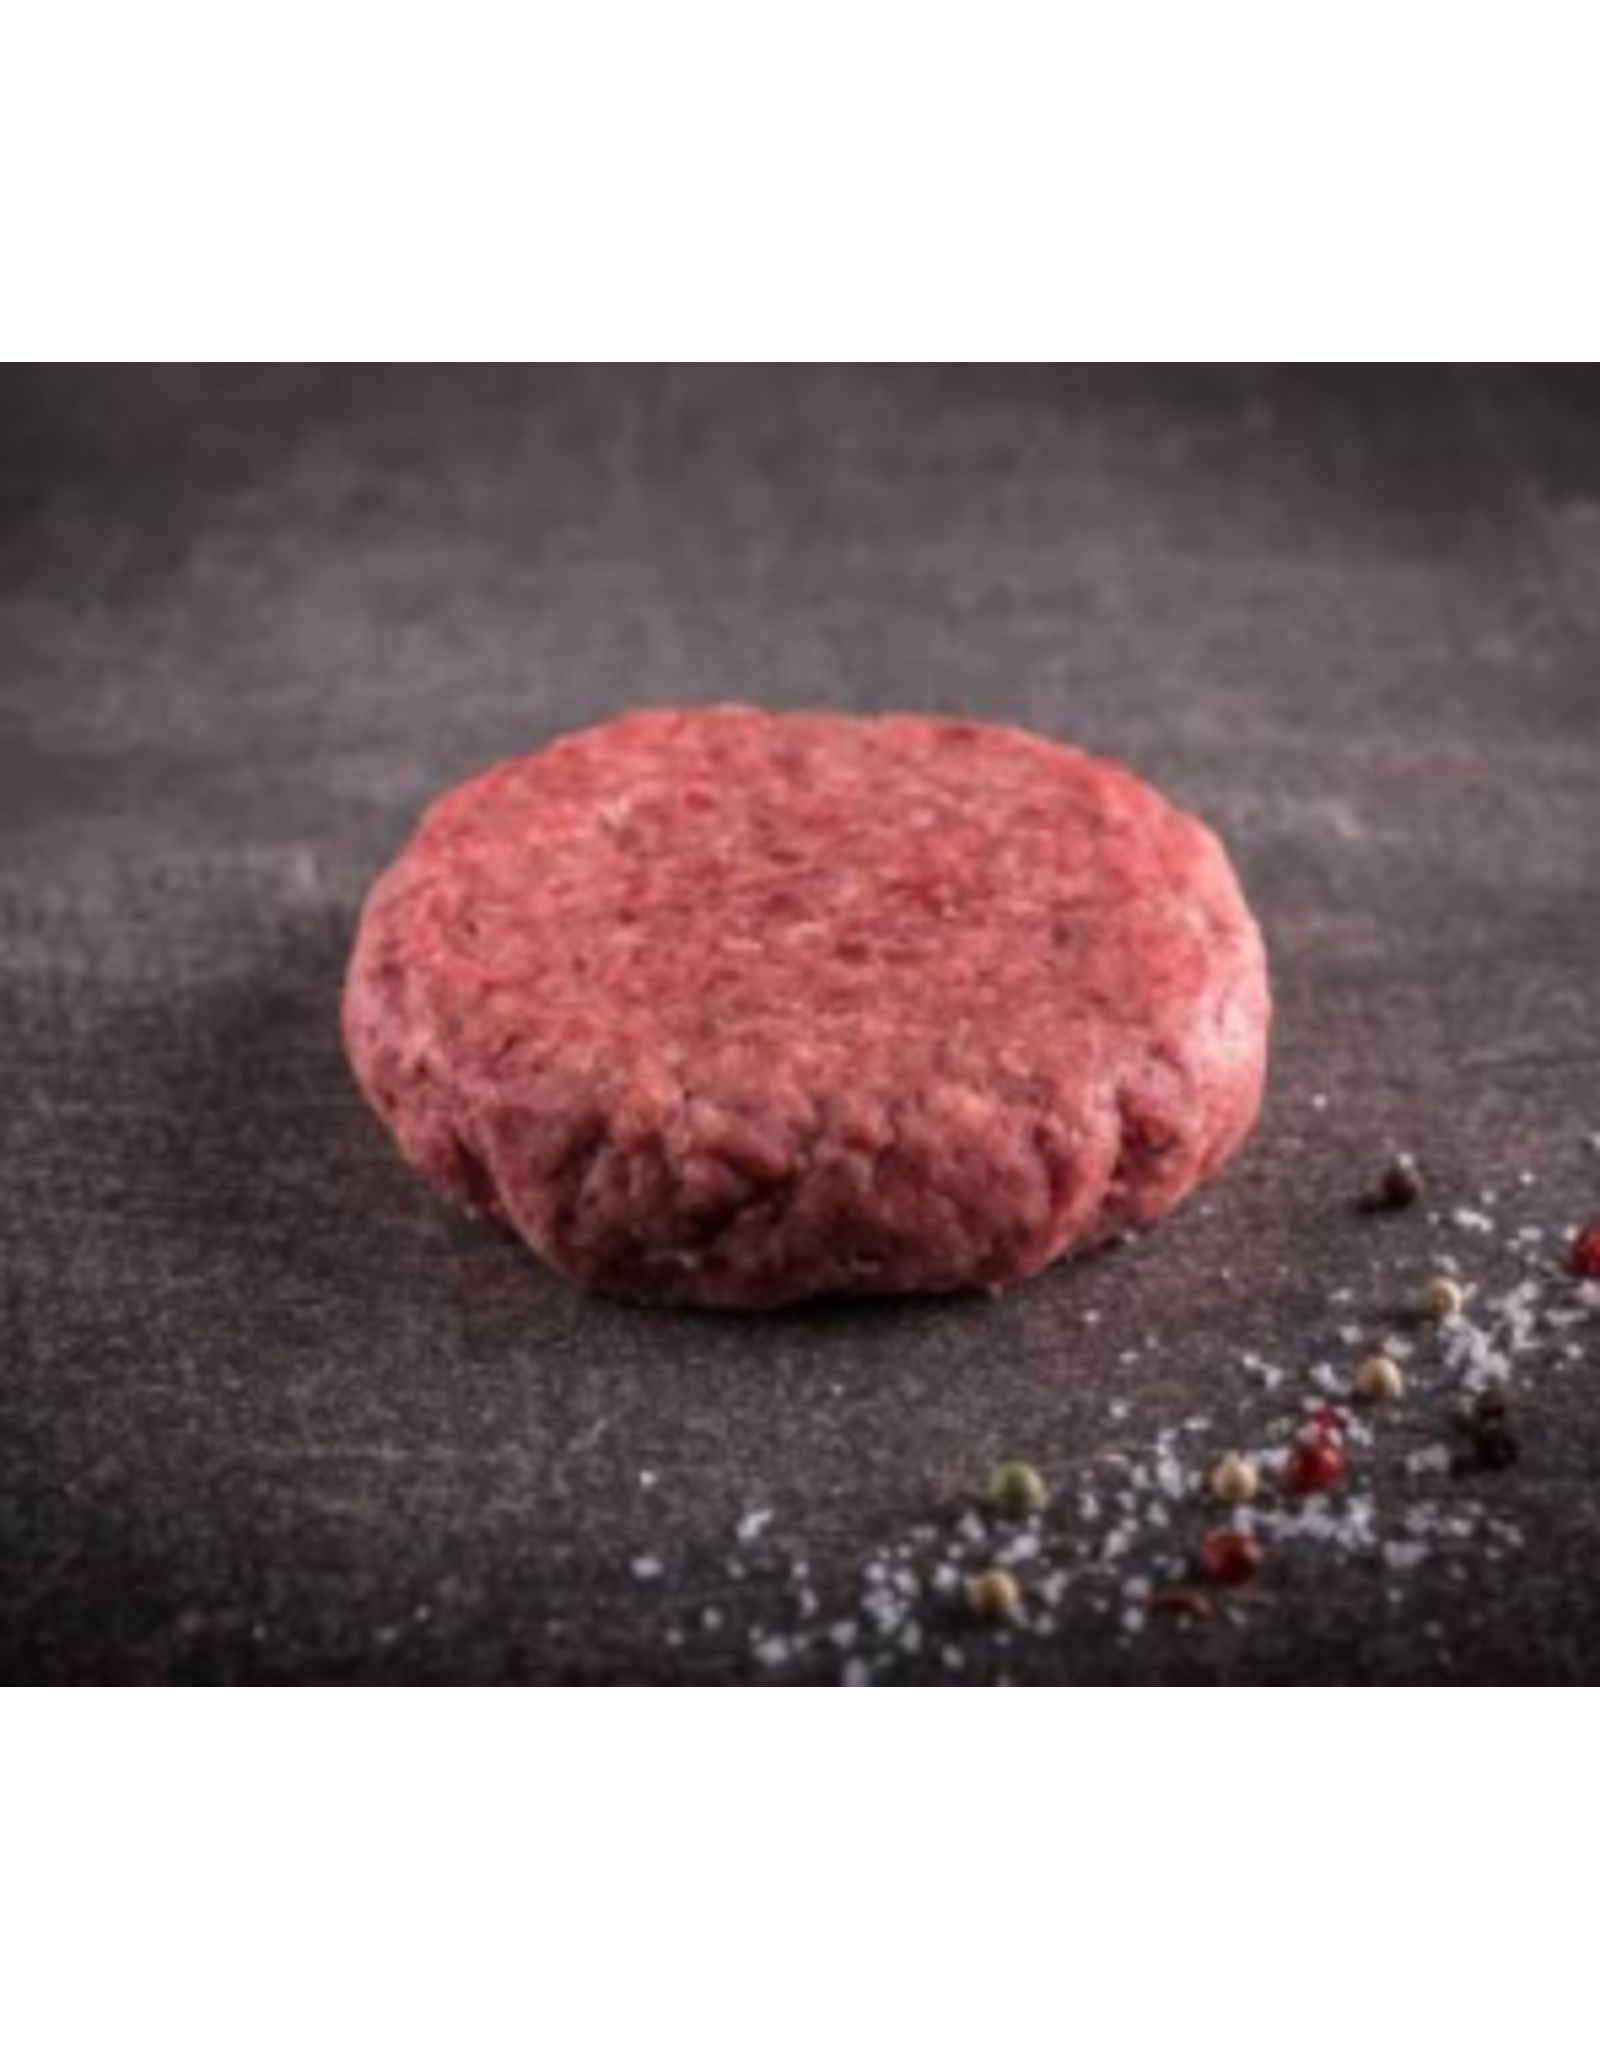 Beyond Burger 2x113g ❄️❄️❄️lose